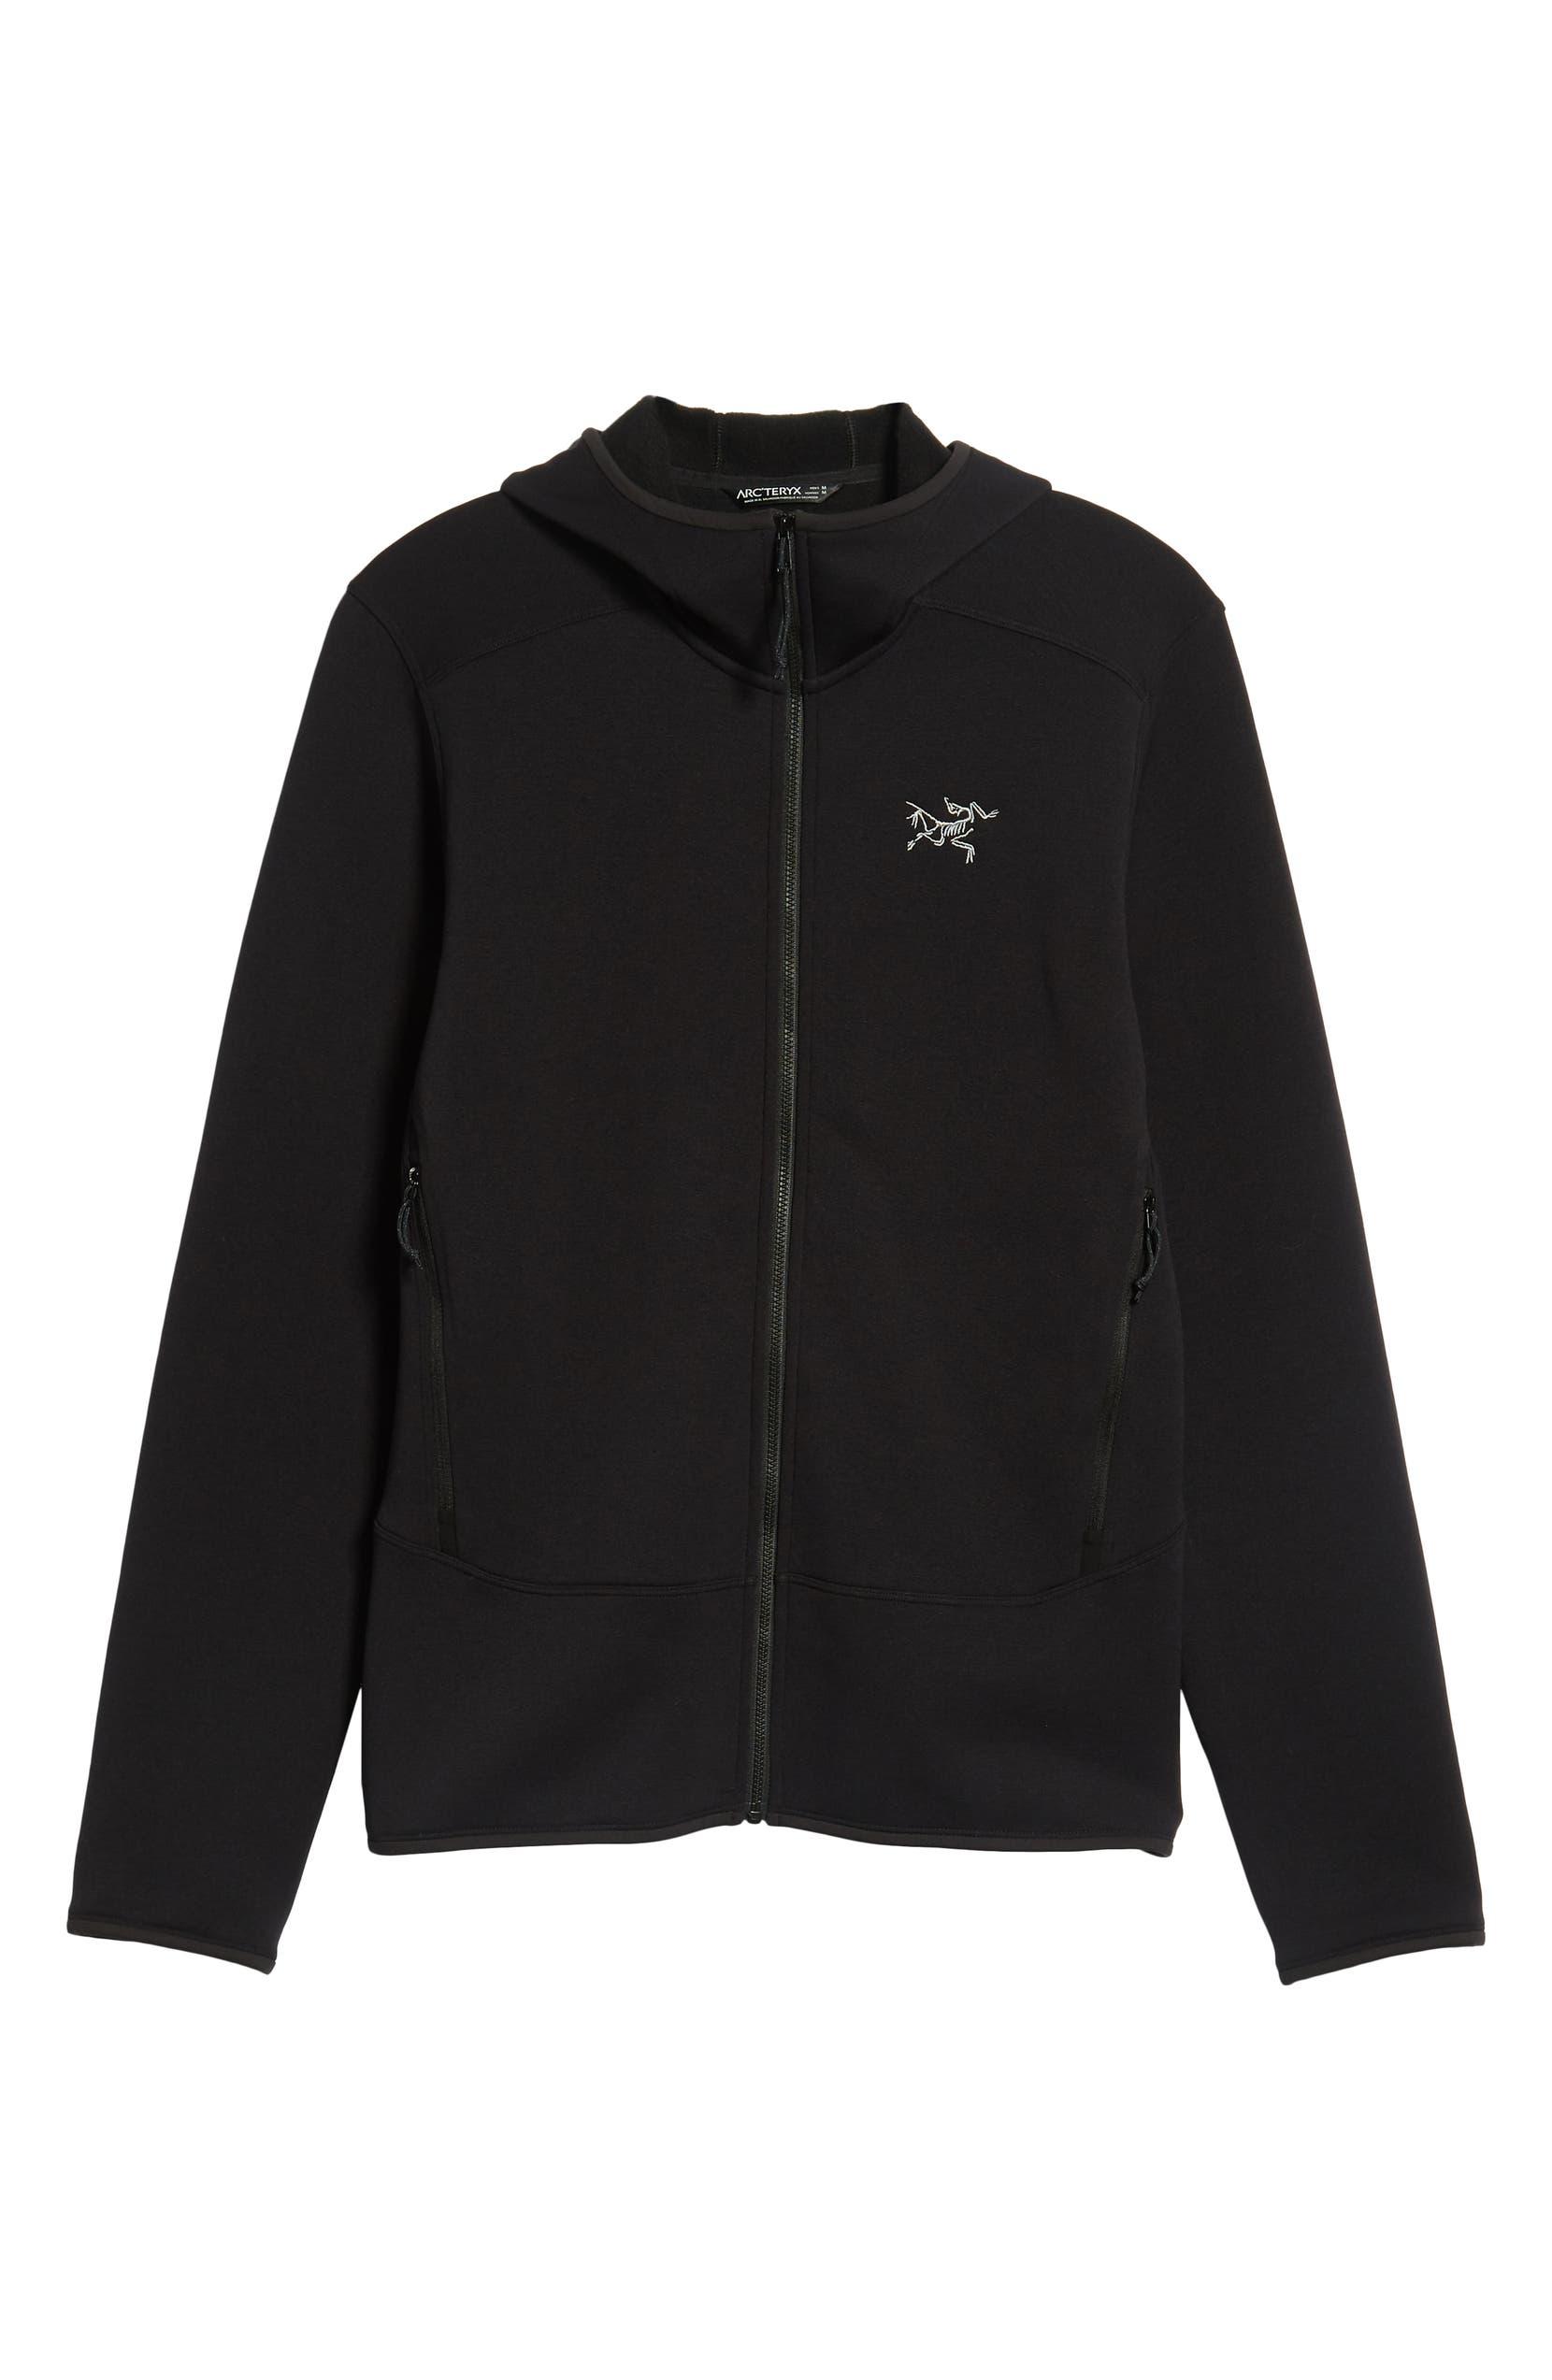 959e21a9d6d Arc'teryx Kyanite Hoodie Jacket | Nordstrom